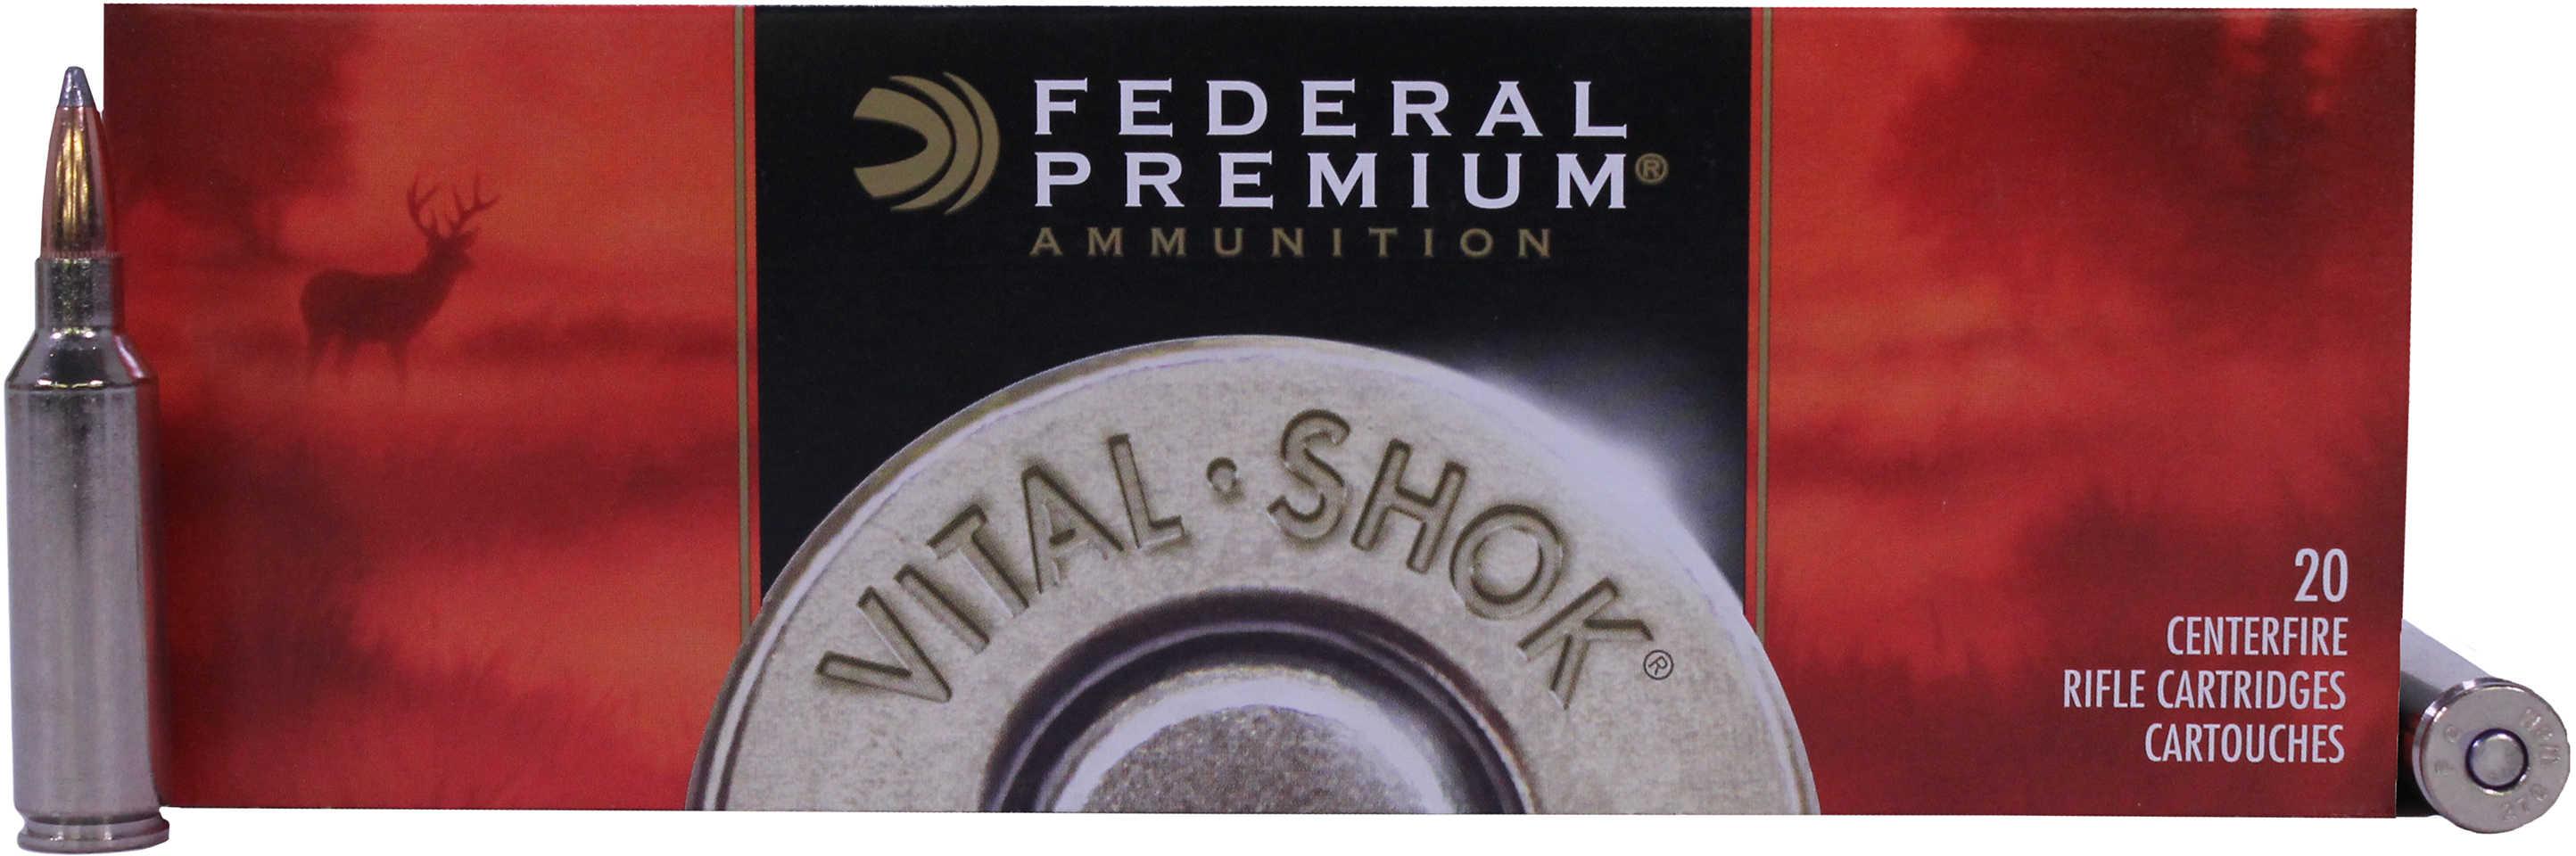 Federal Cartridge 270 Winchester Short Magnum 270 WSM, 150grain, Nosler Partition, (Per 20) P270WSMC